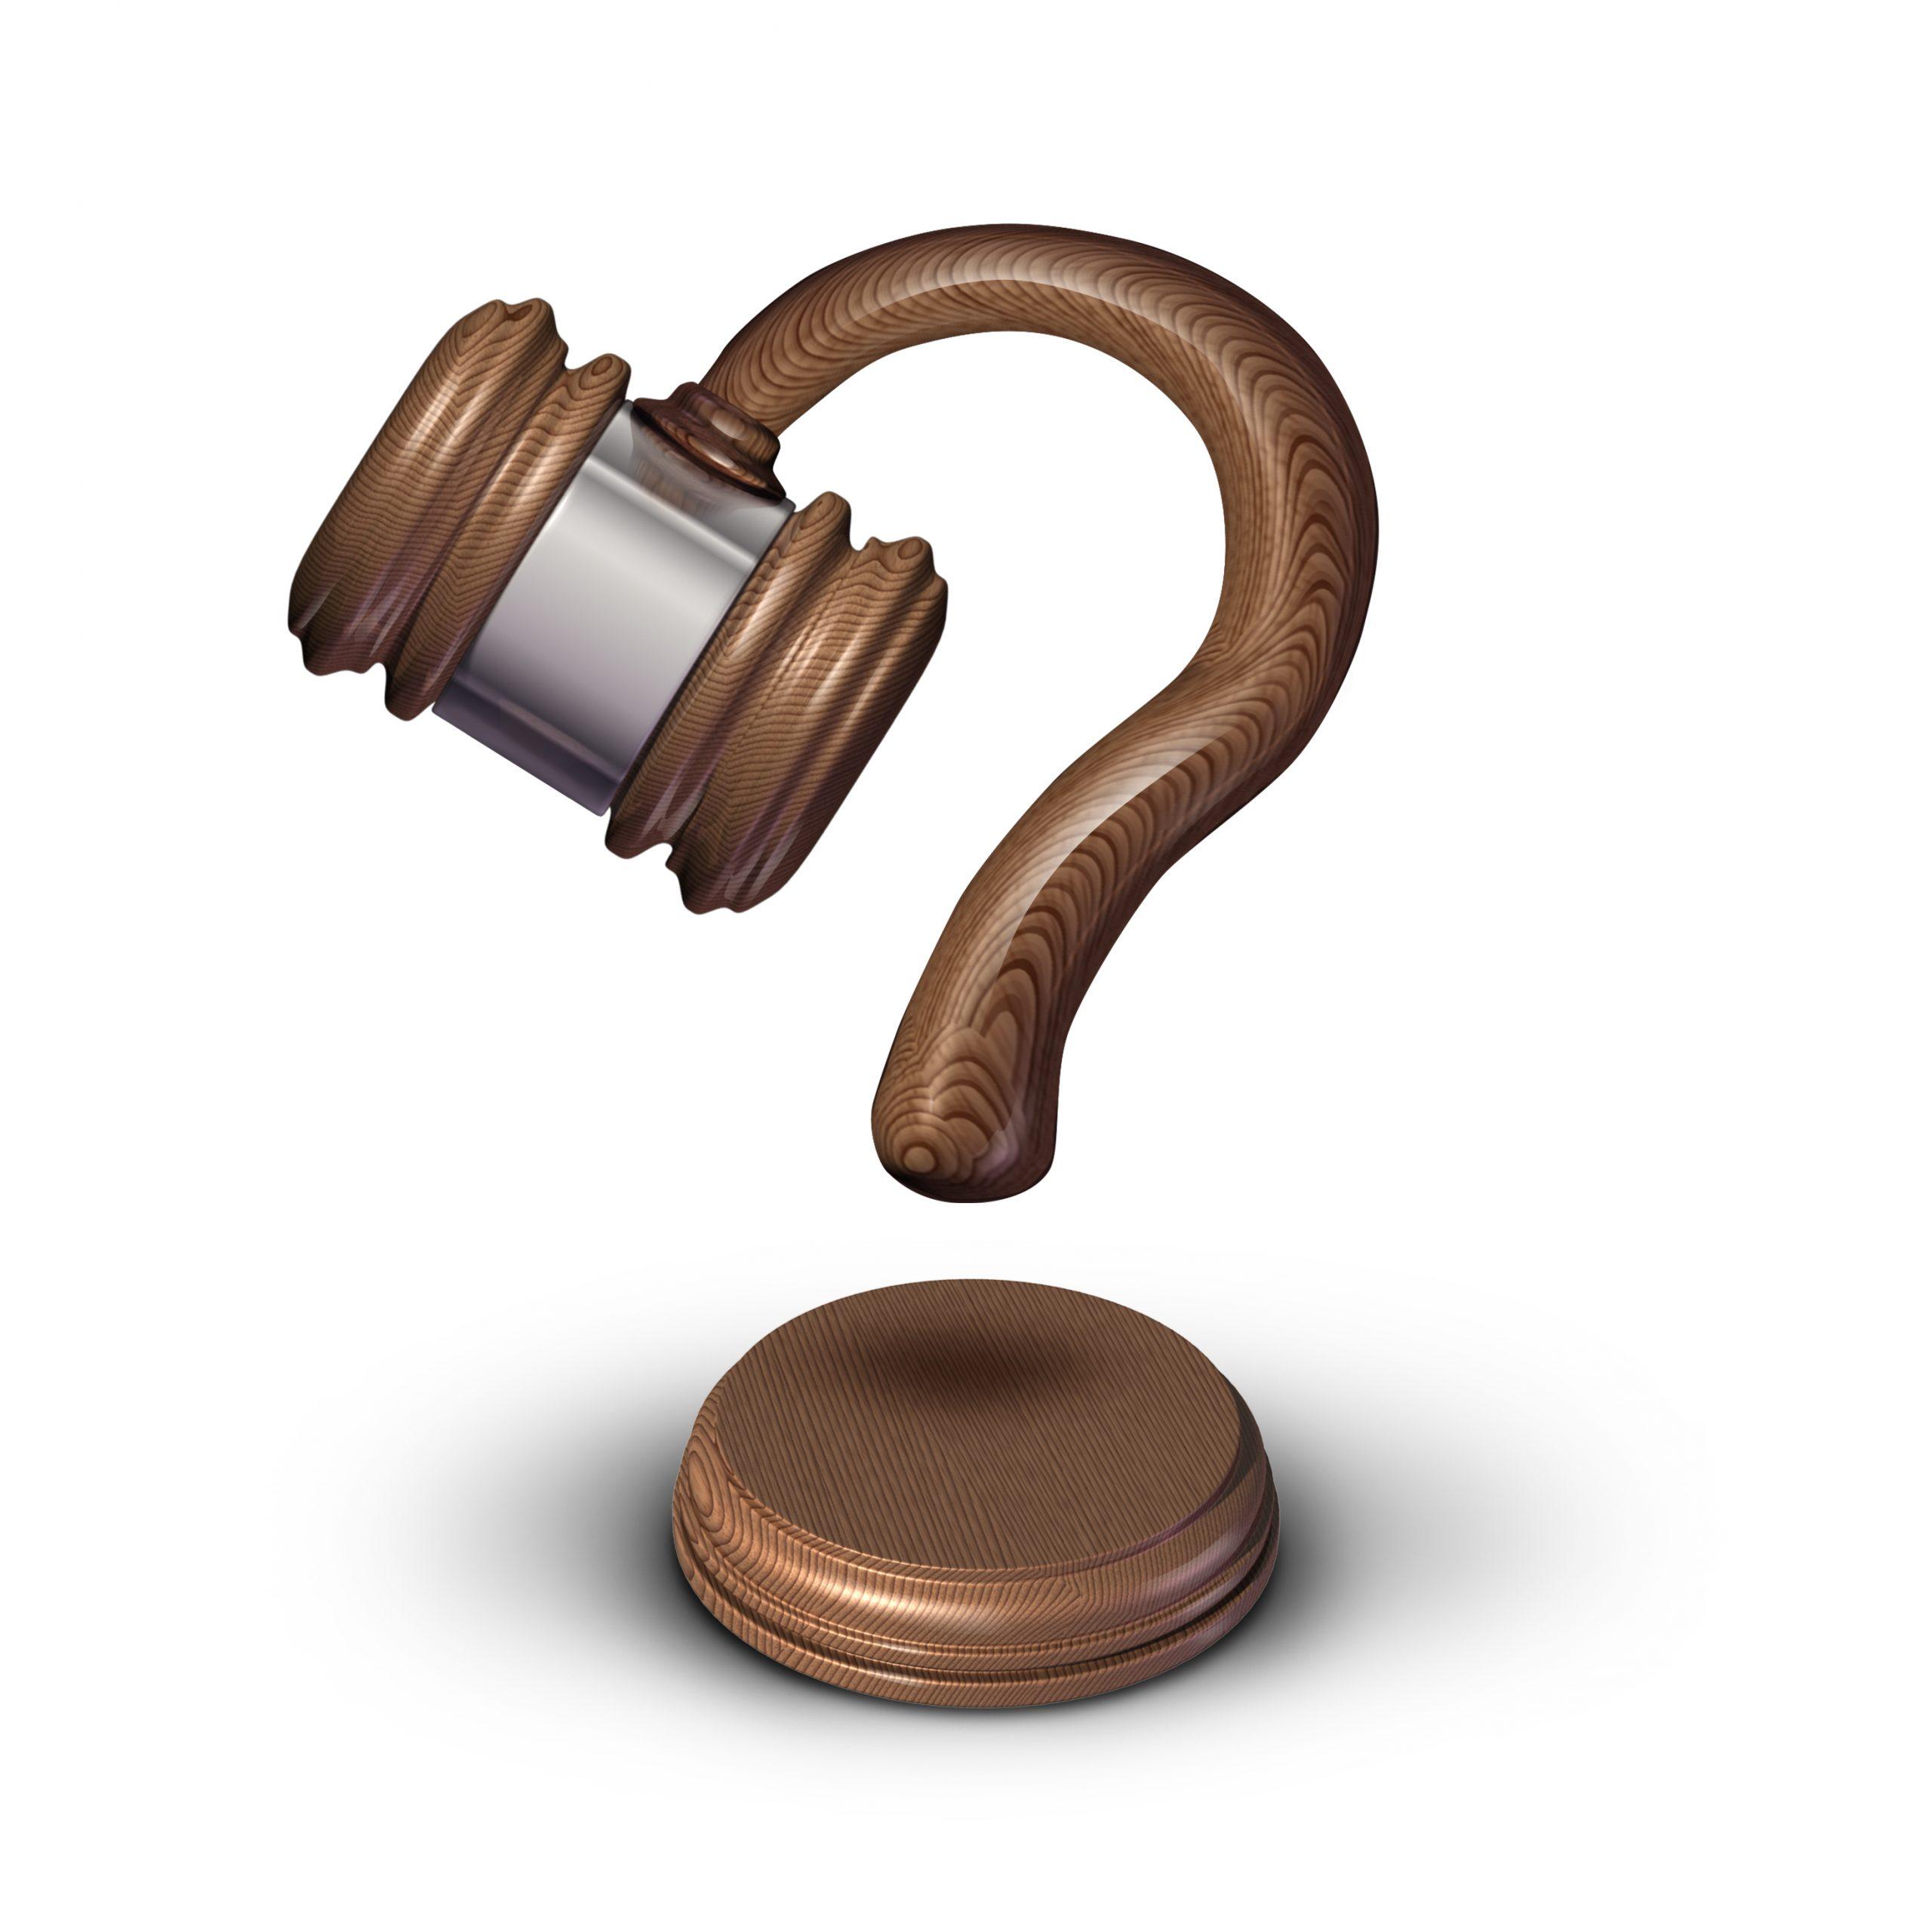 https://depositphotos.com/100383942/stock-photo-legal-questions-concept.html